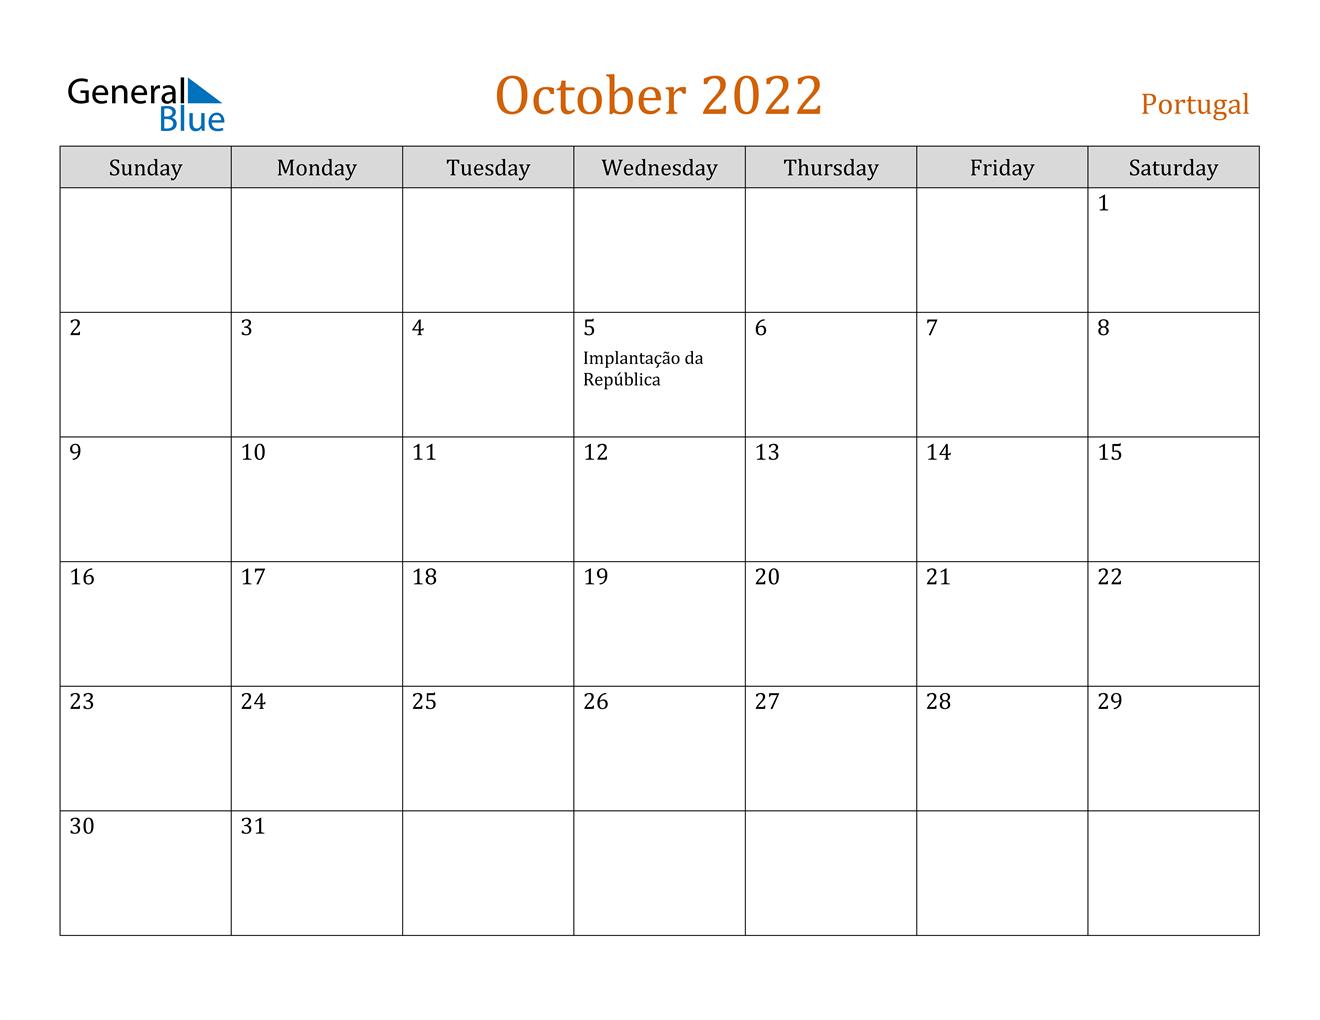 October 2022 Calendar - Portugal